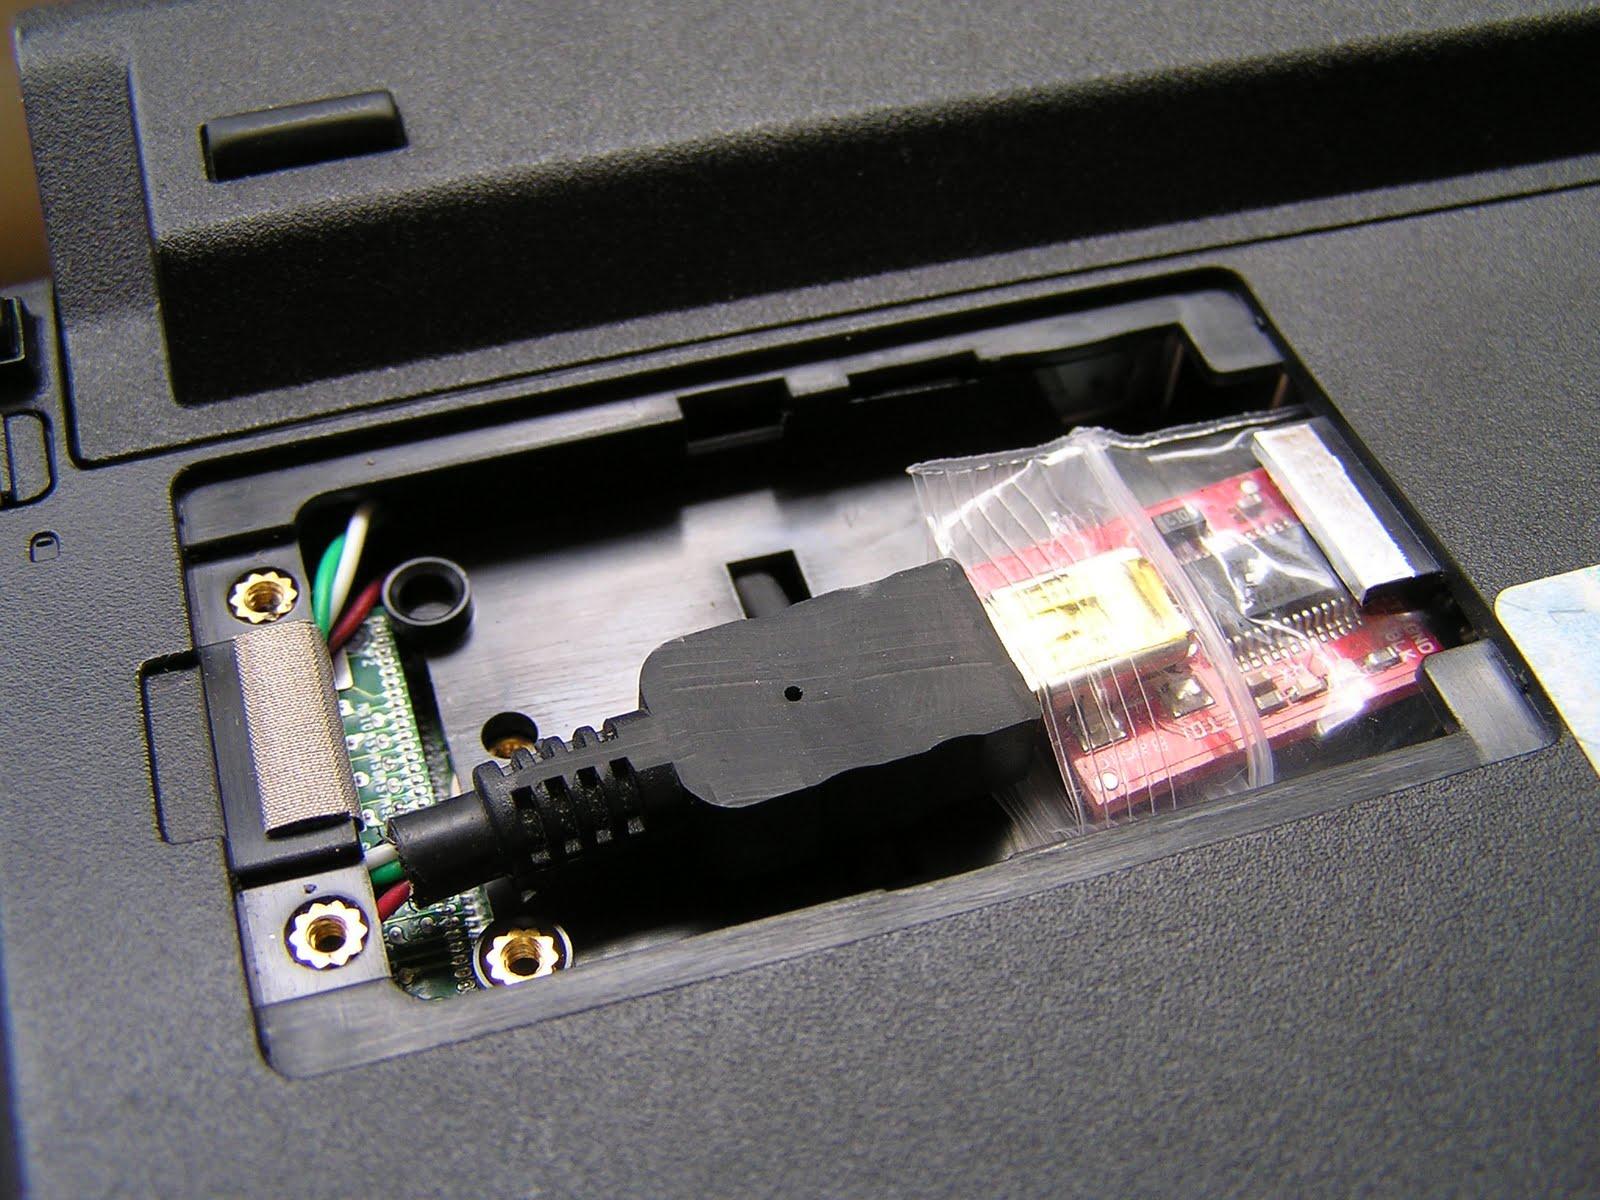 Hardware hack arduino inside